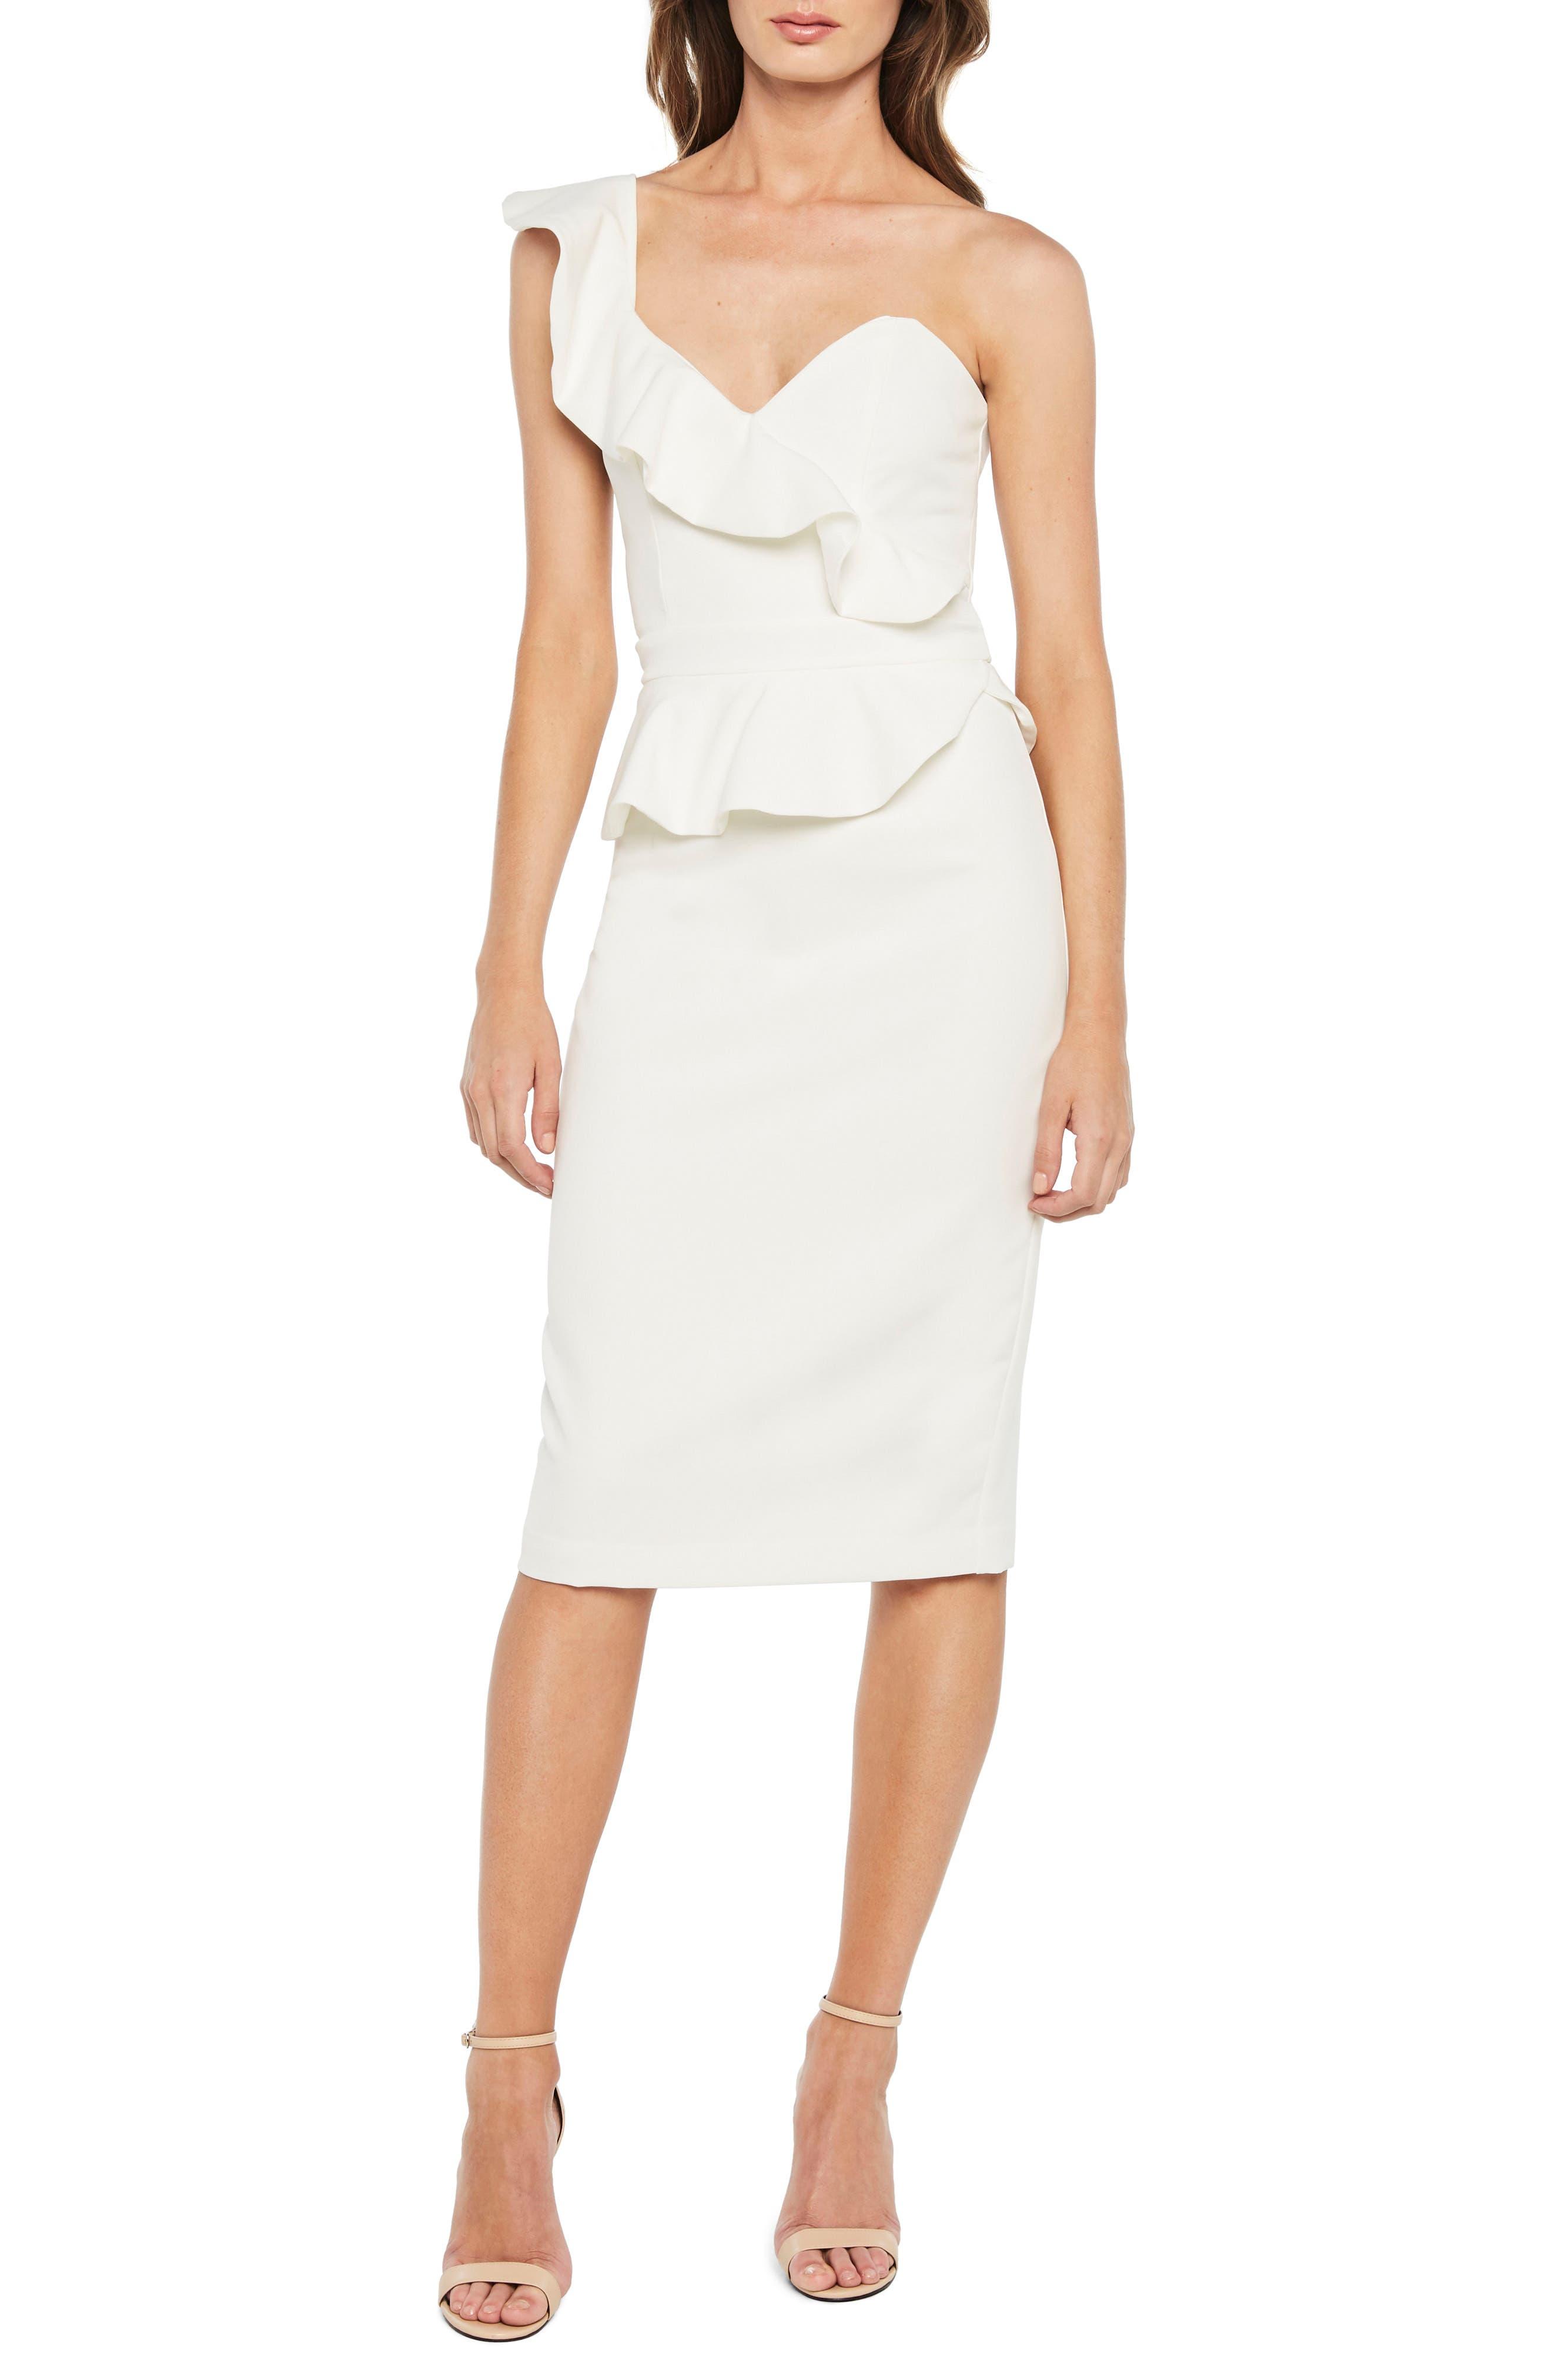 Alternate Image 1 Selected - Bardot Camellia One-Shoulder Sheath Dress